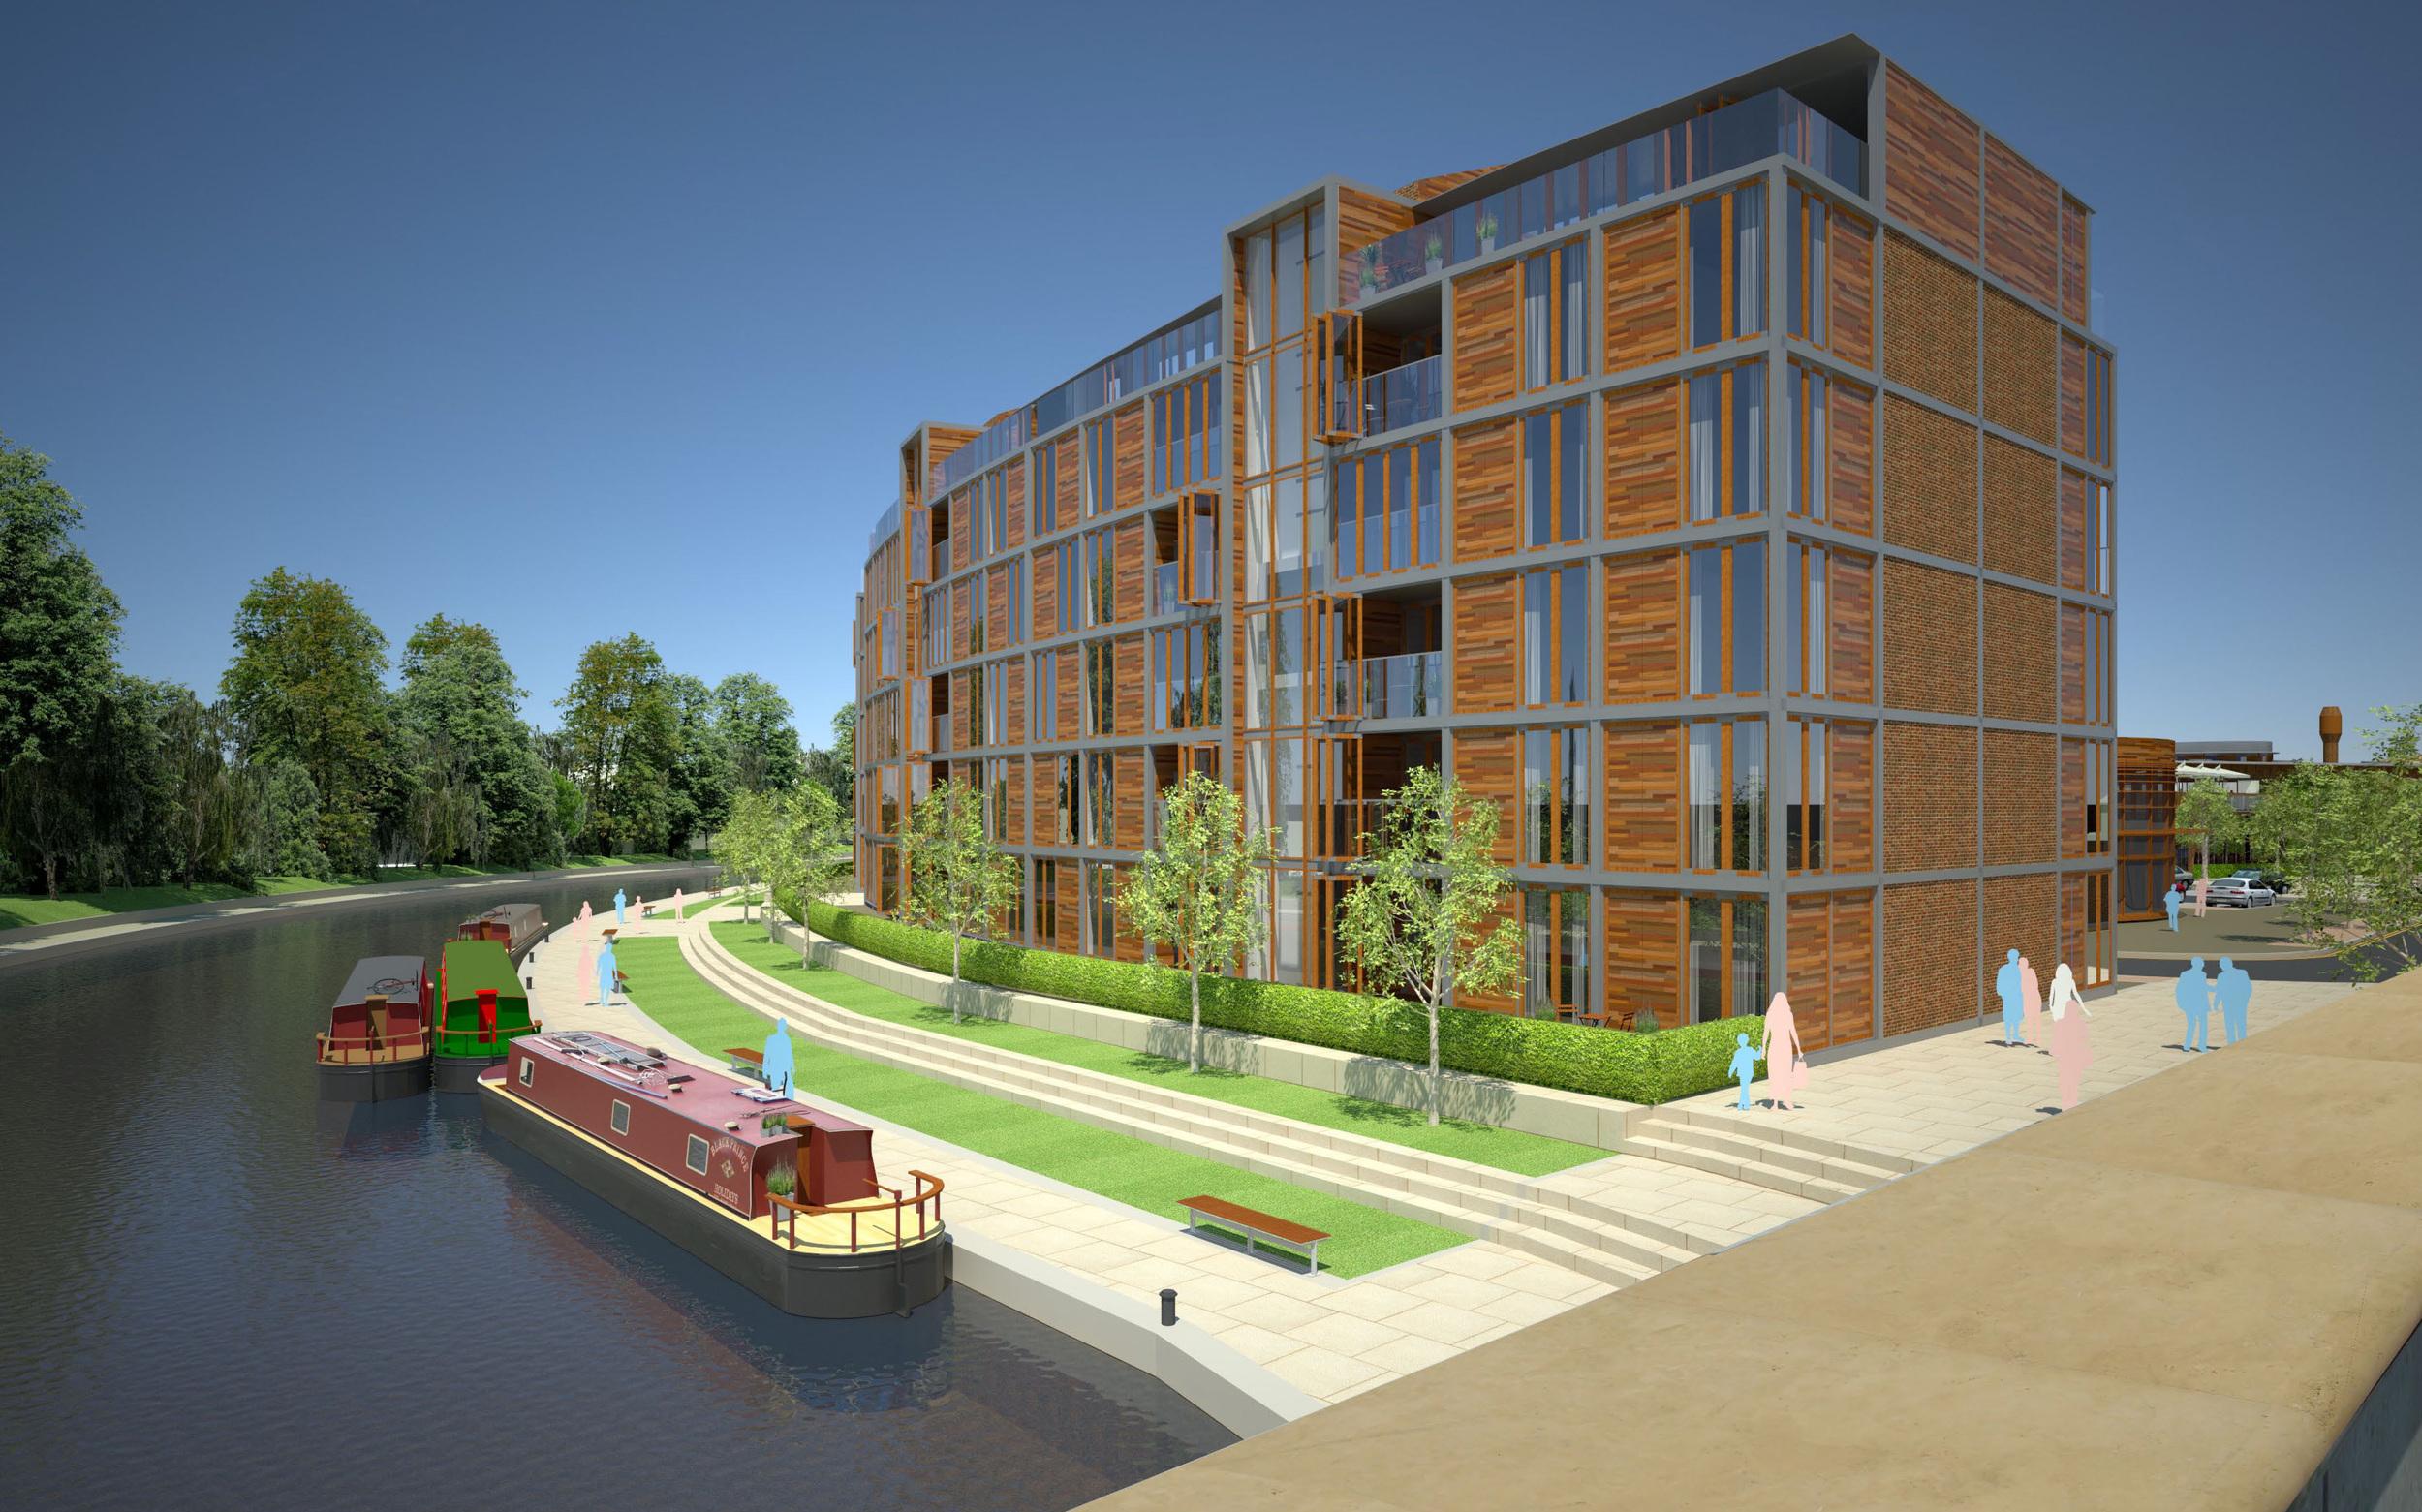 Masterplanning: Greenford, London